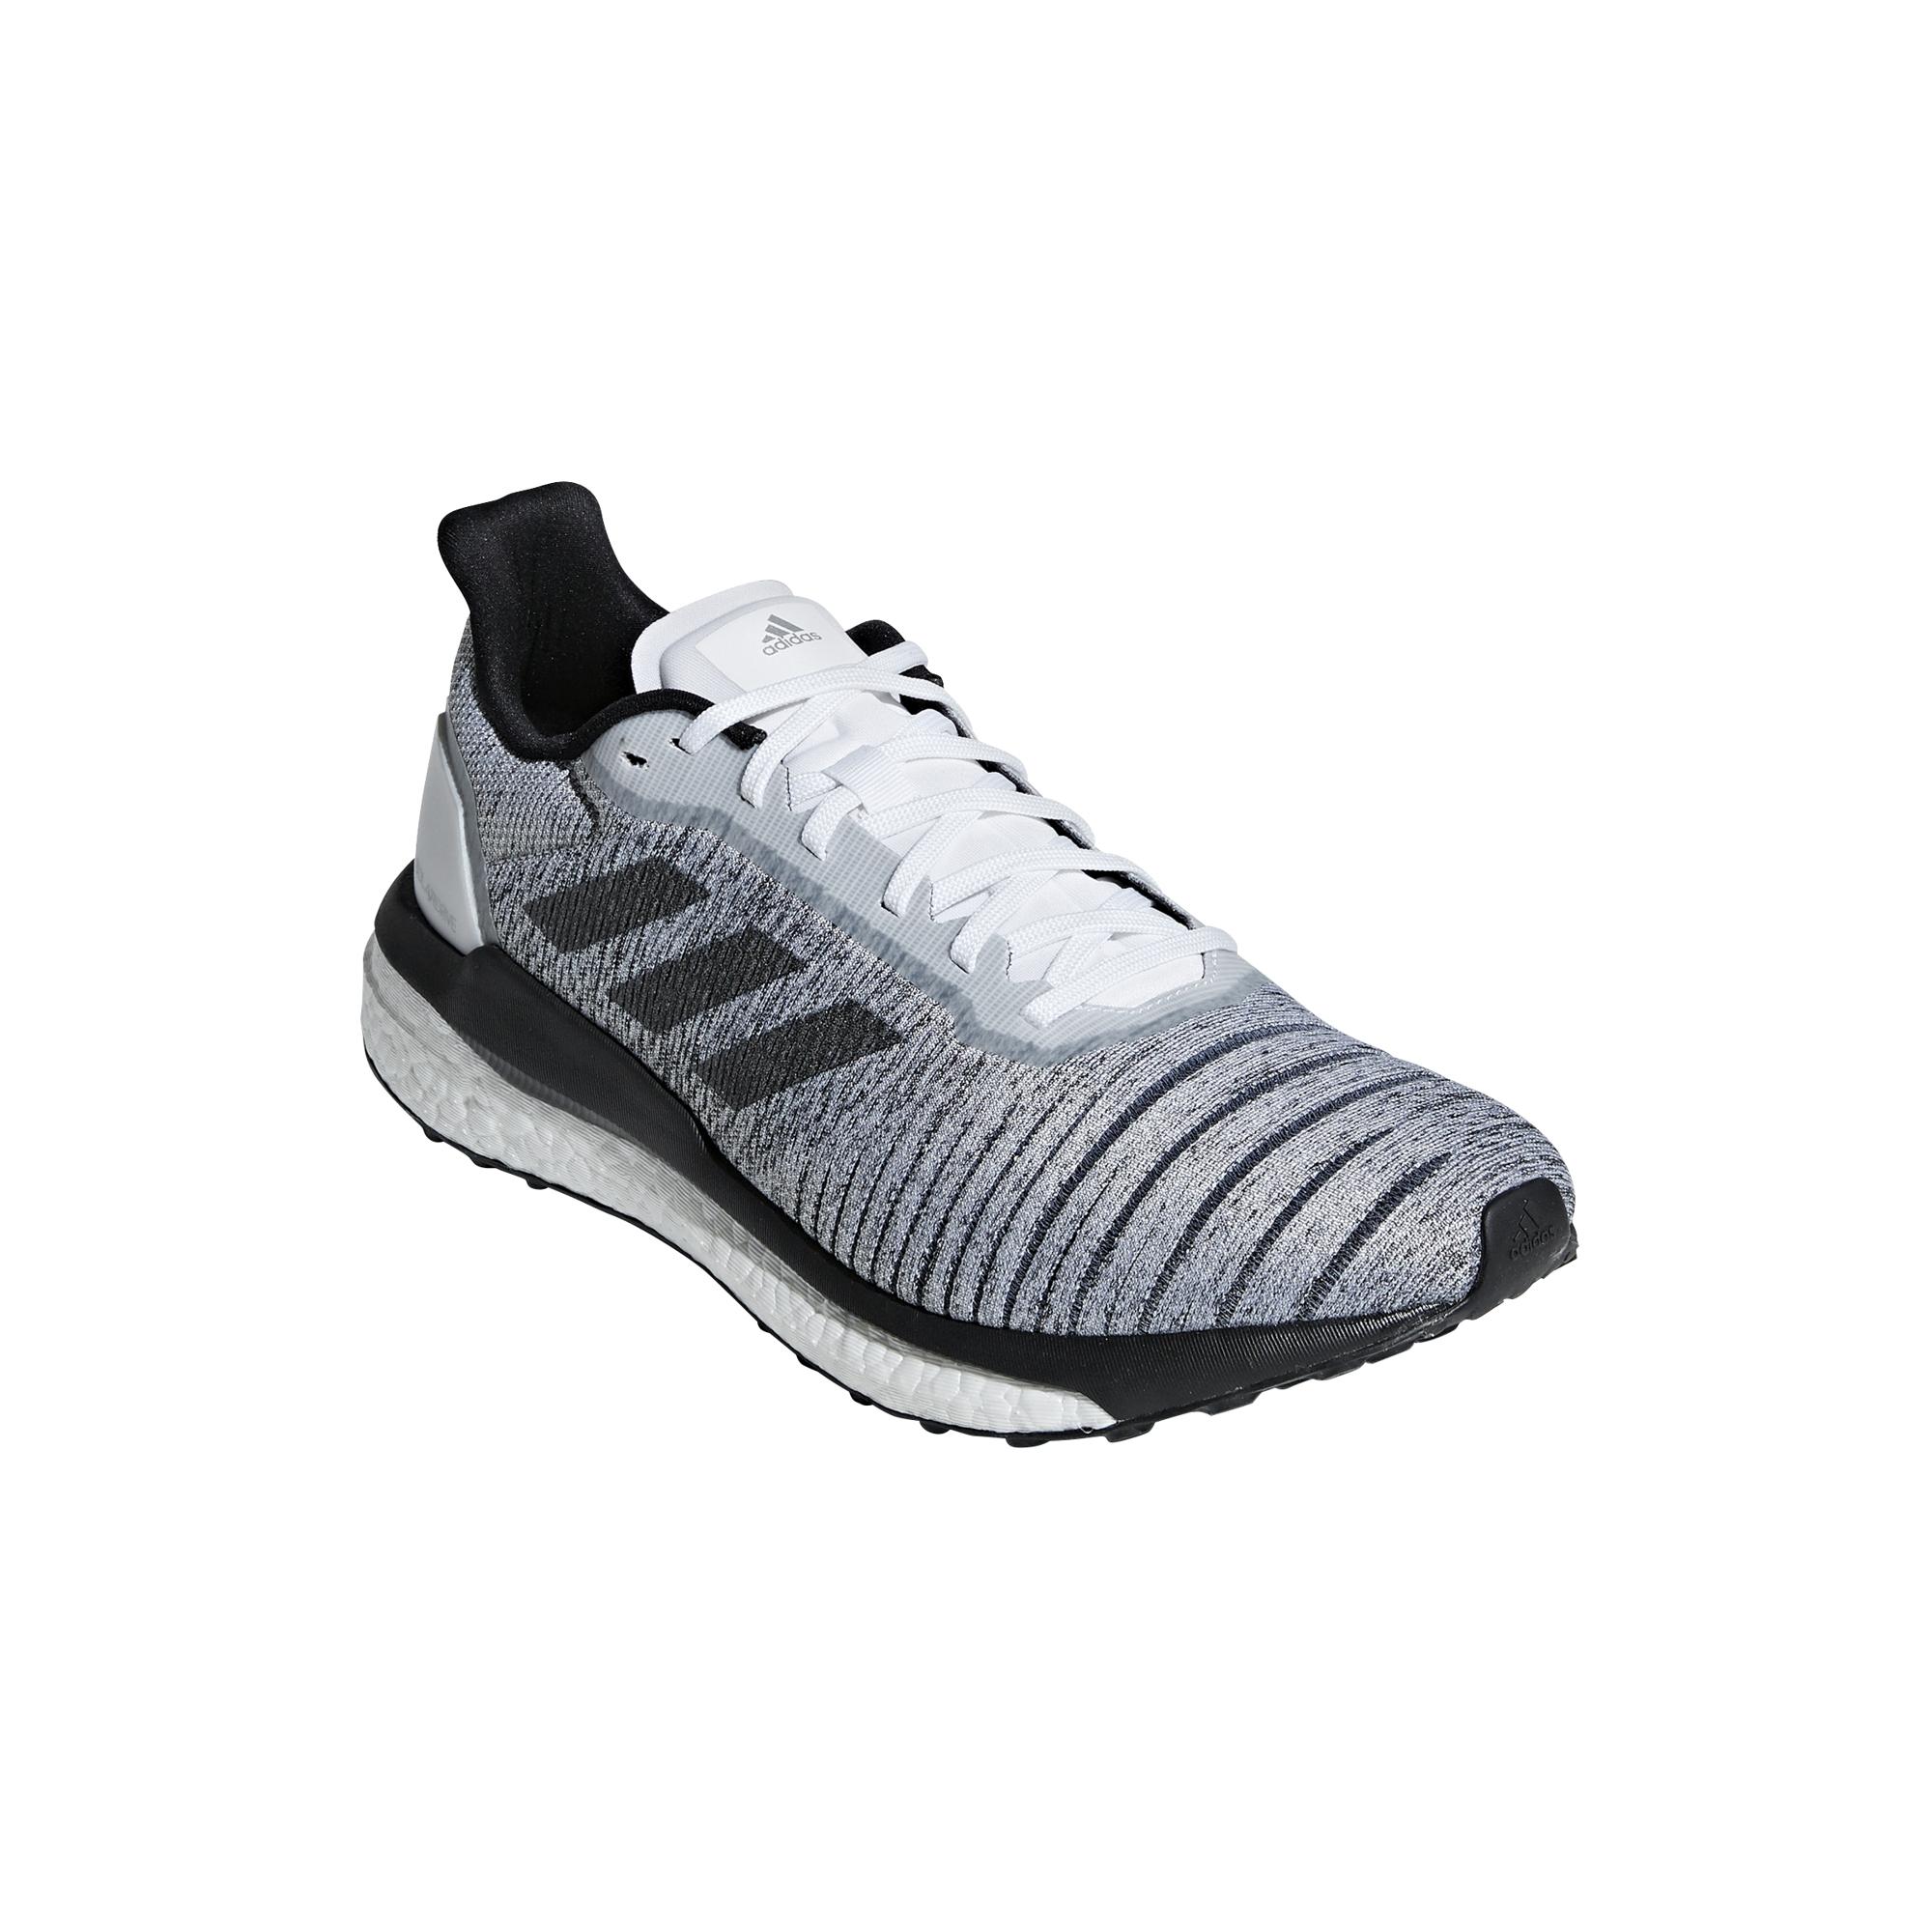 b6042933a6c Chaussures adidas Solar Drive